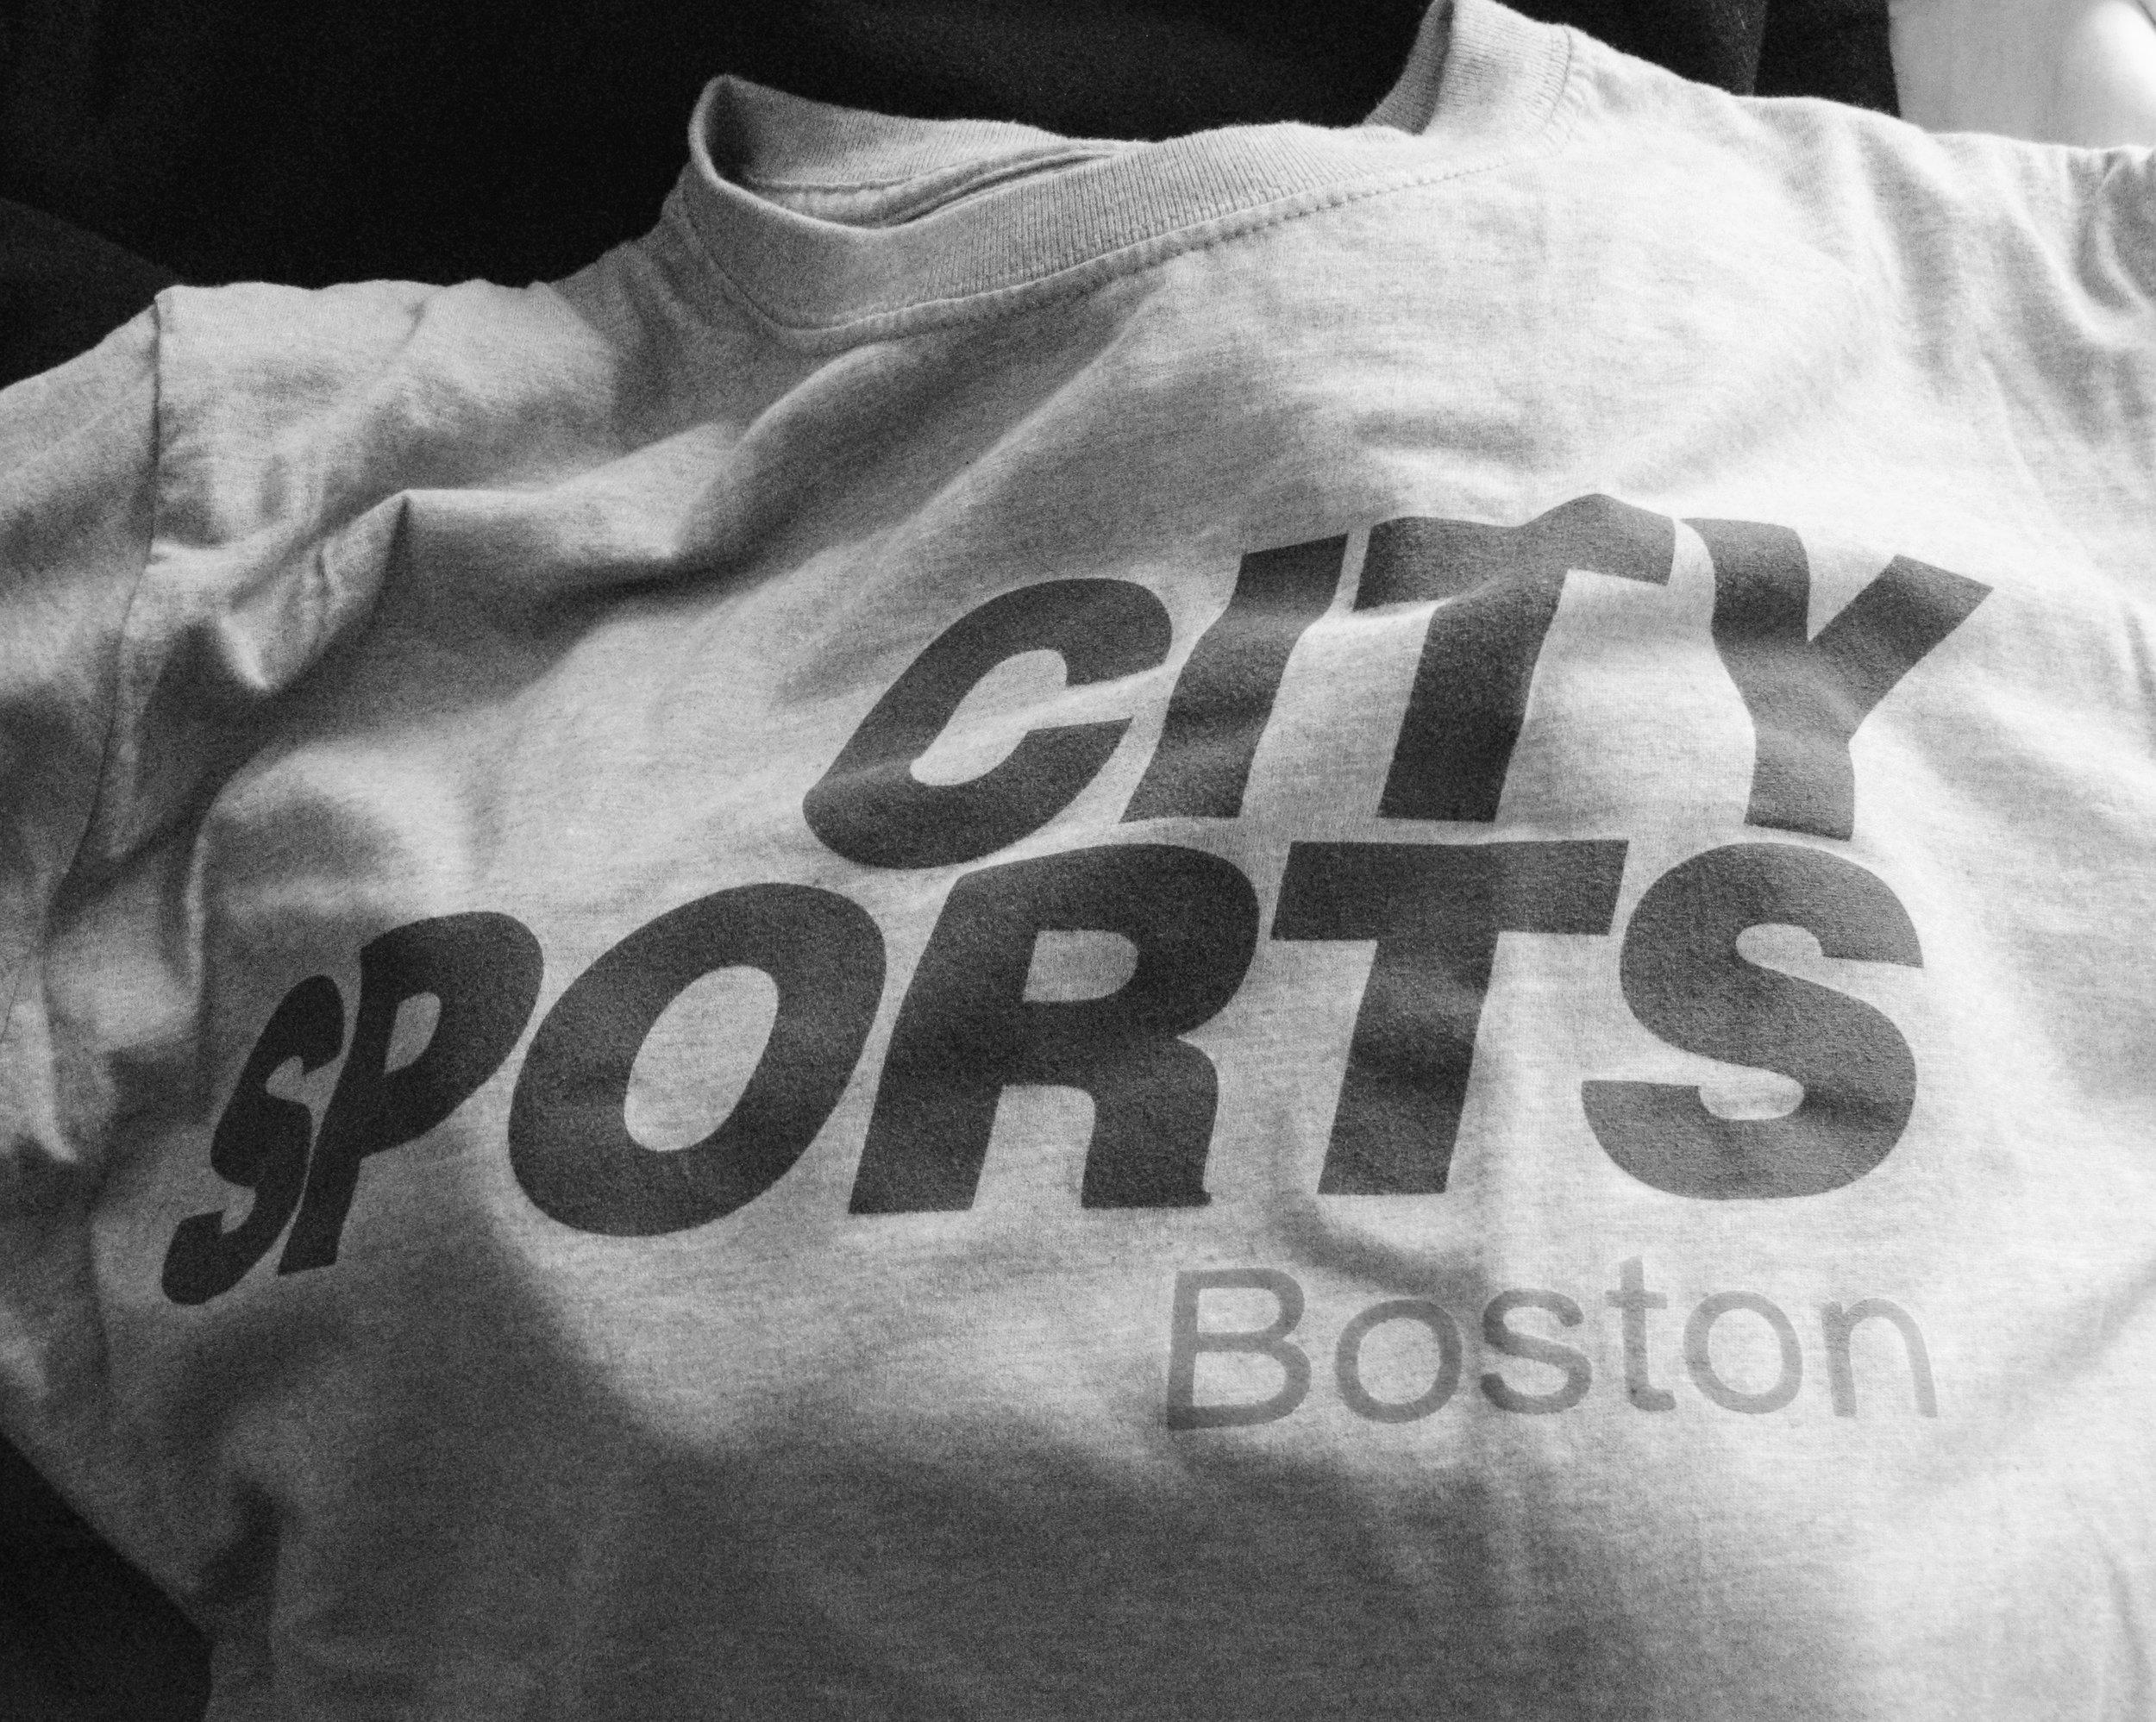 city sports boston t shirt